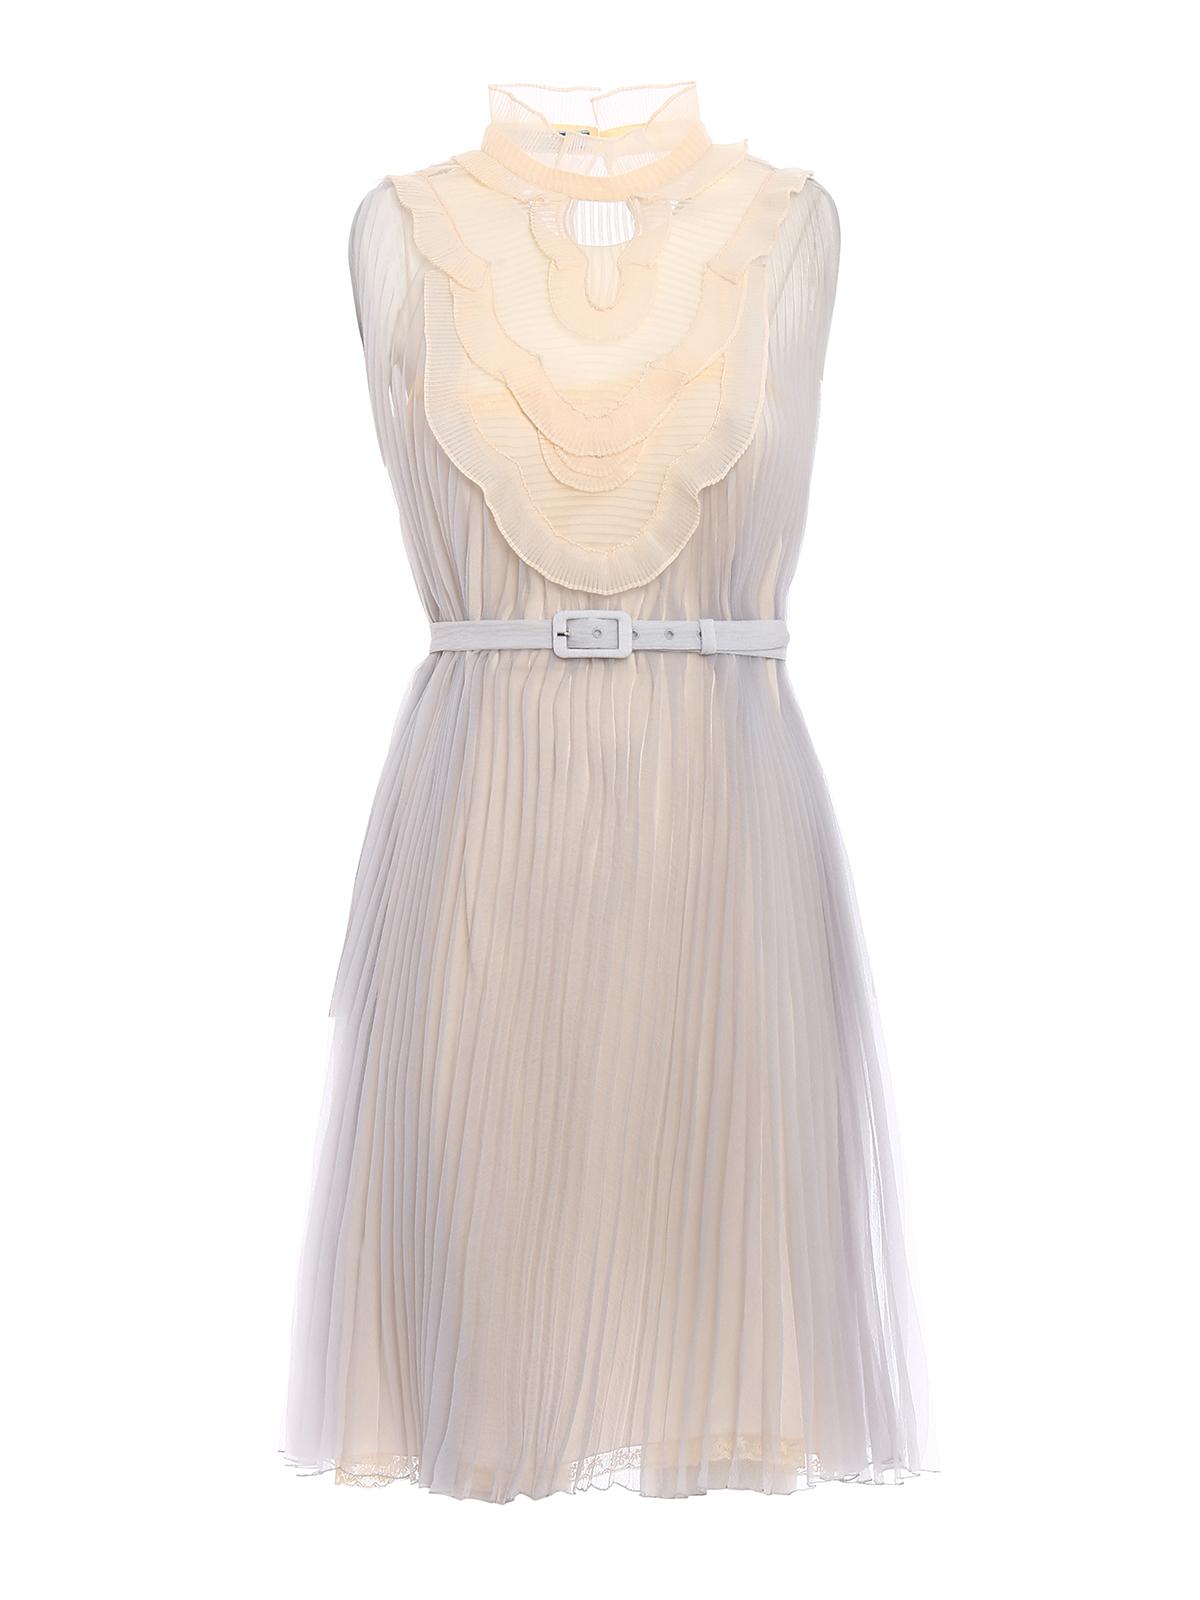 Großzügig Prada Cocktailkleid Fotos - Brautkleider Ideen ...